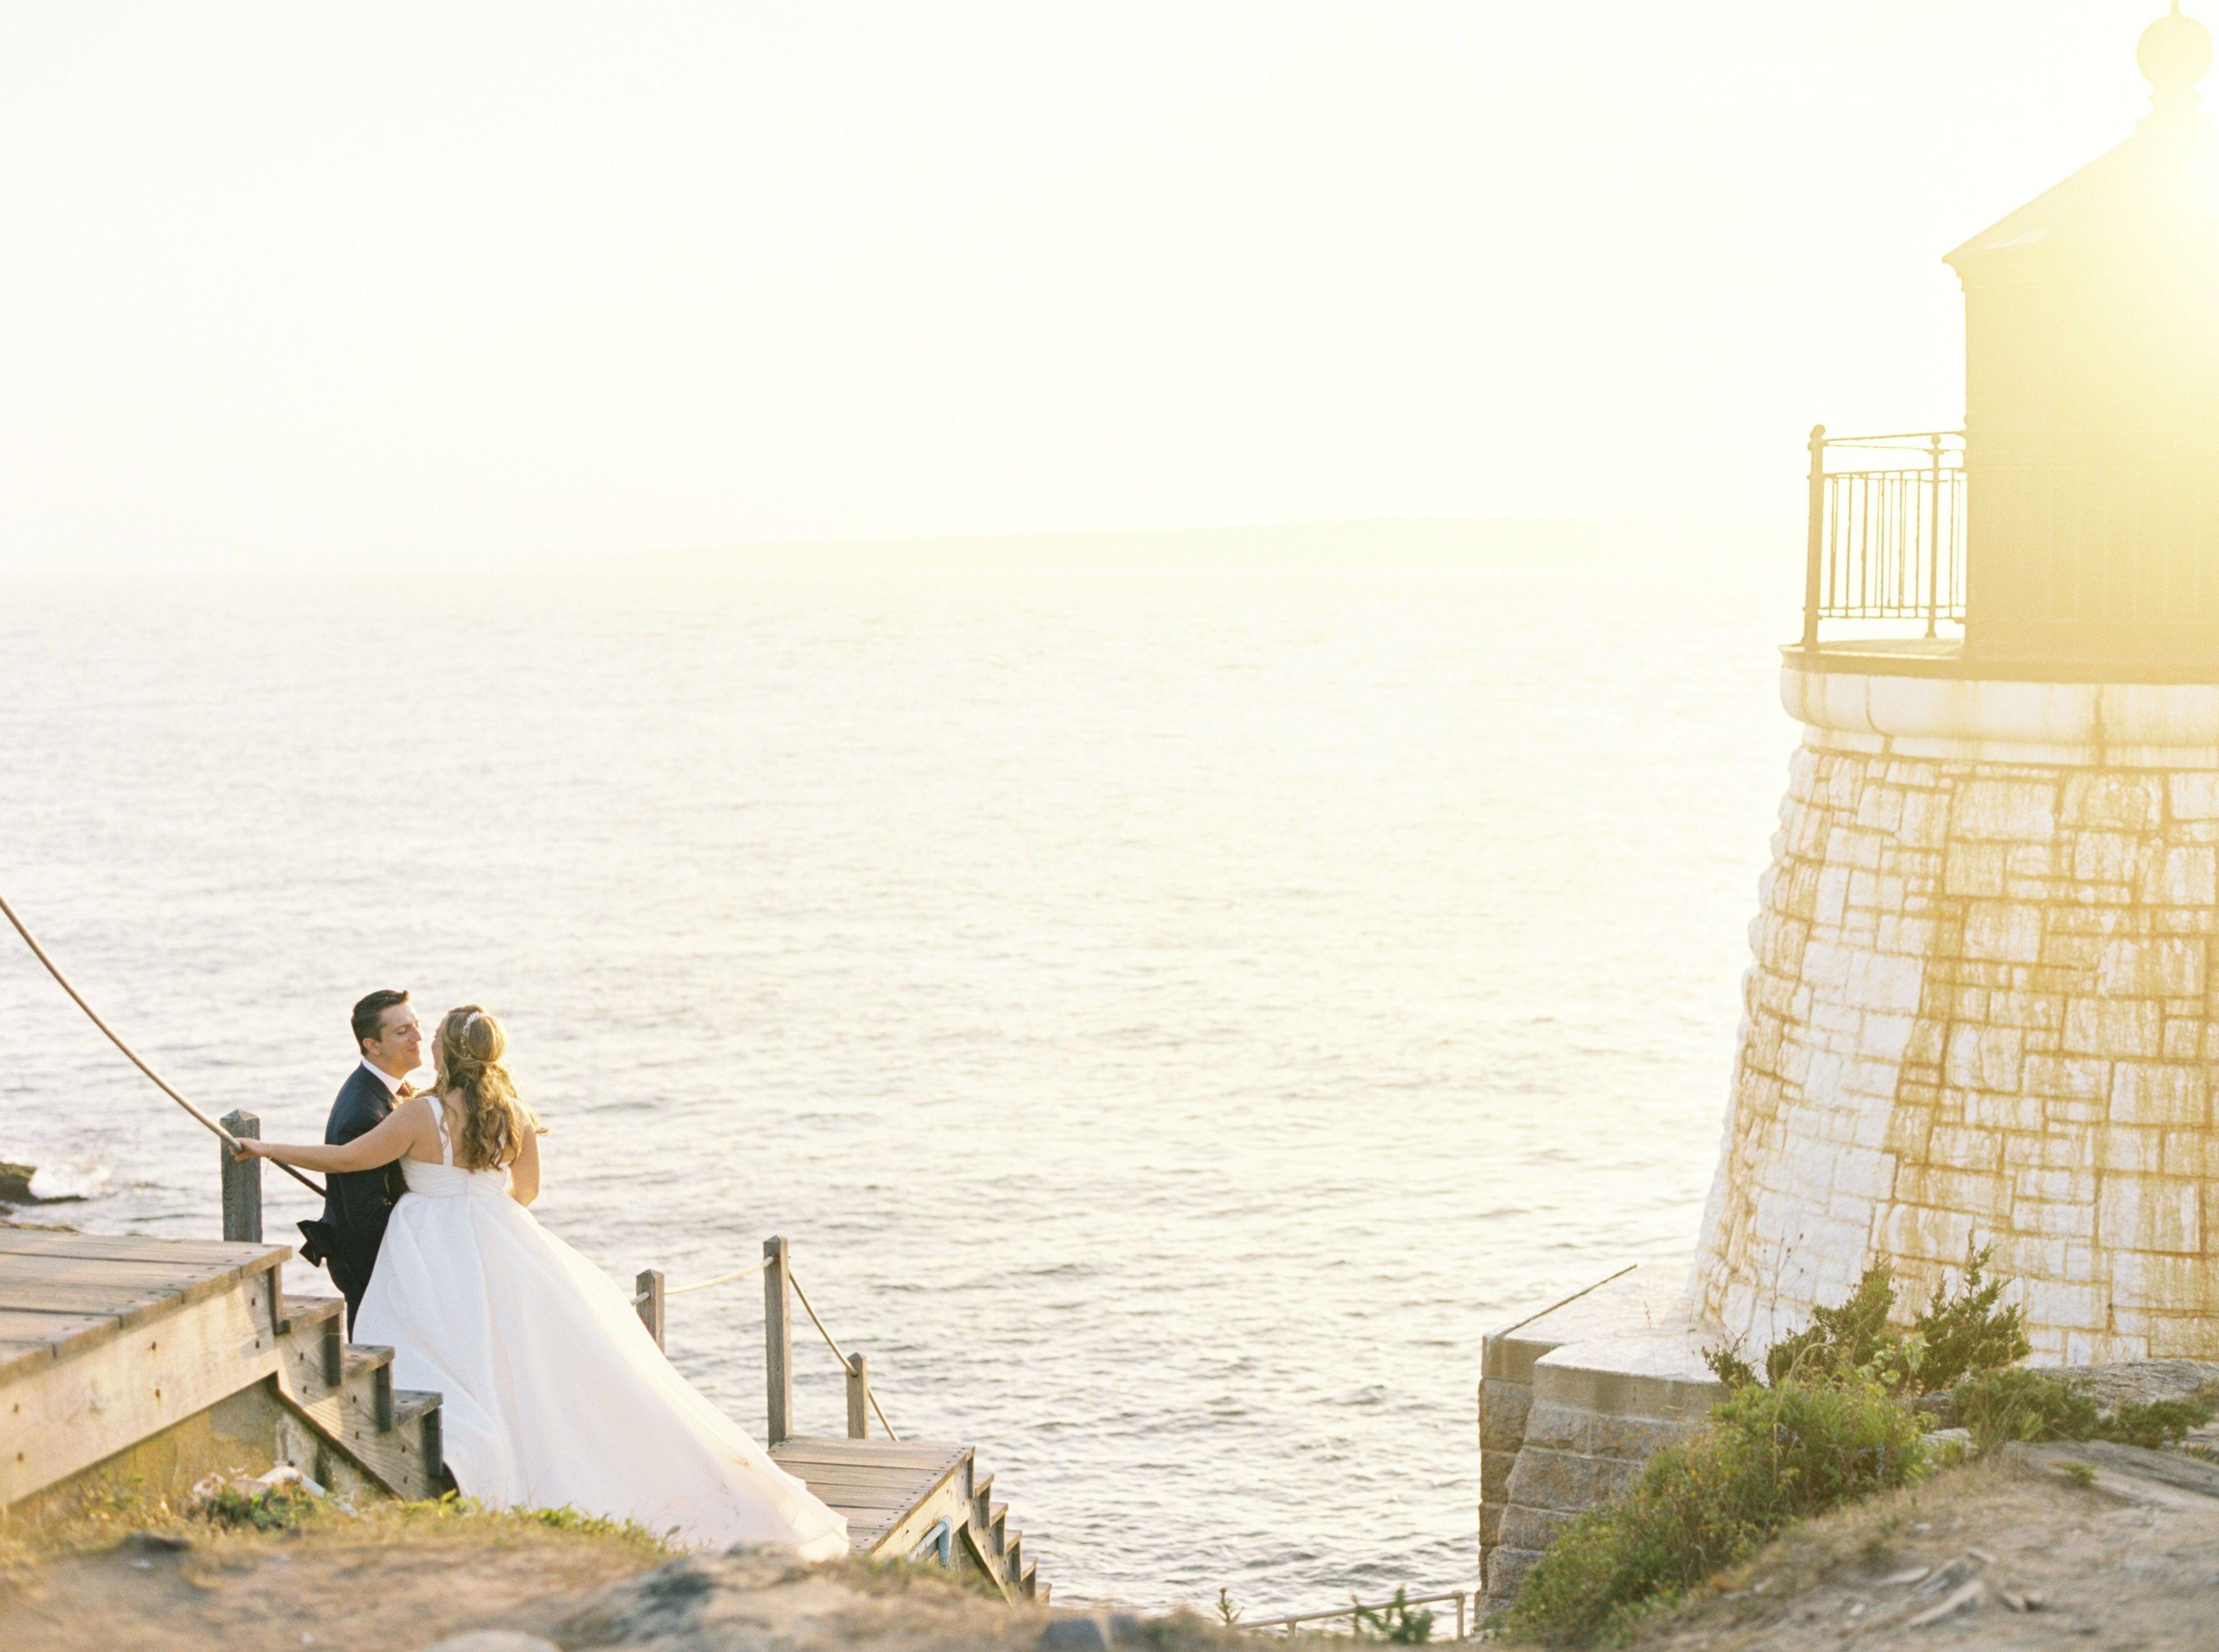 Castle Hill Lighthouse Newport Ri Wedding Venues: Lighthouse Wedding Venue Ri At Reisefeber.org